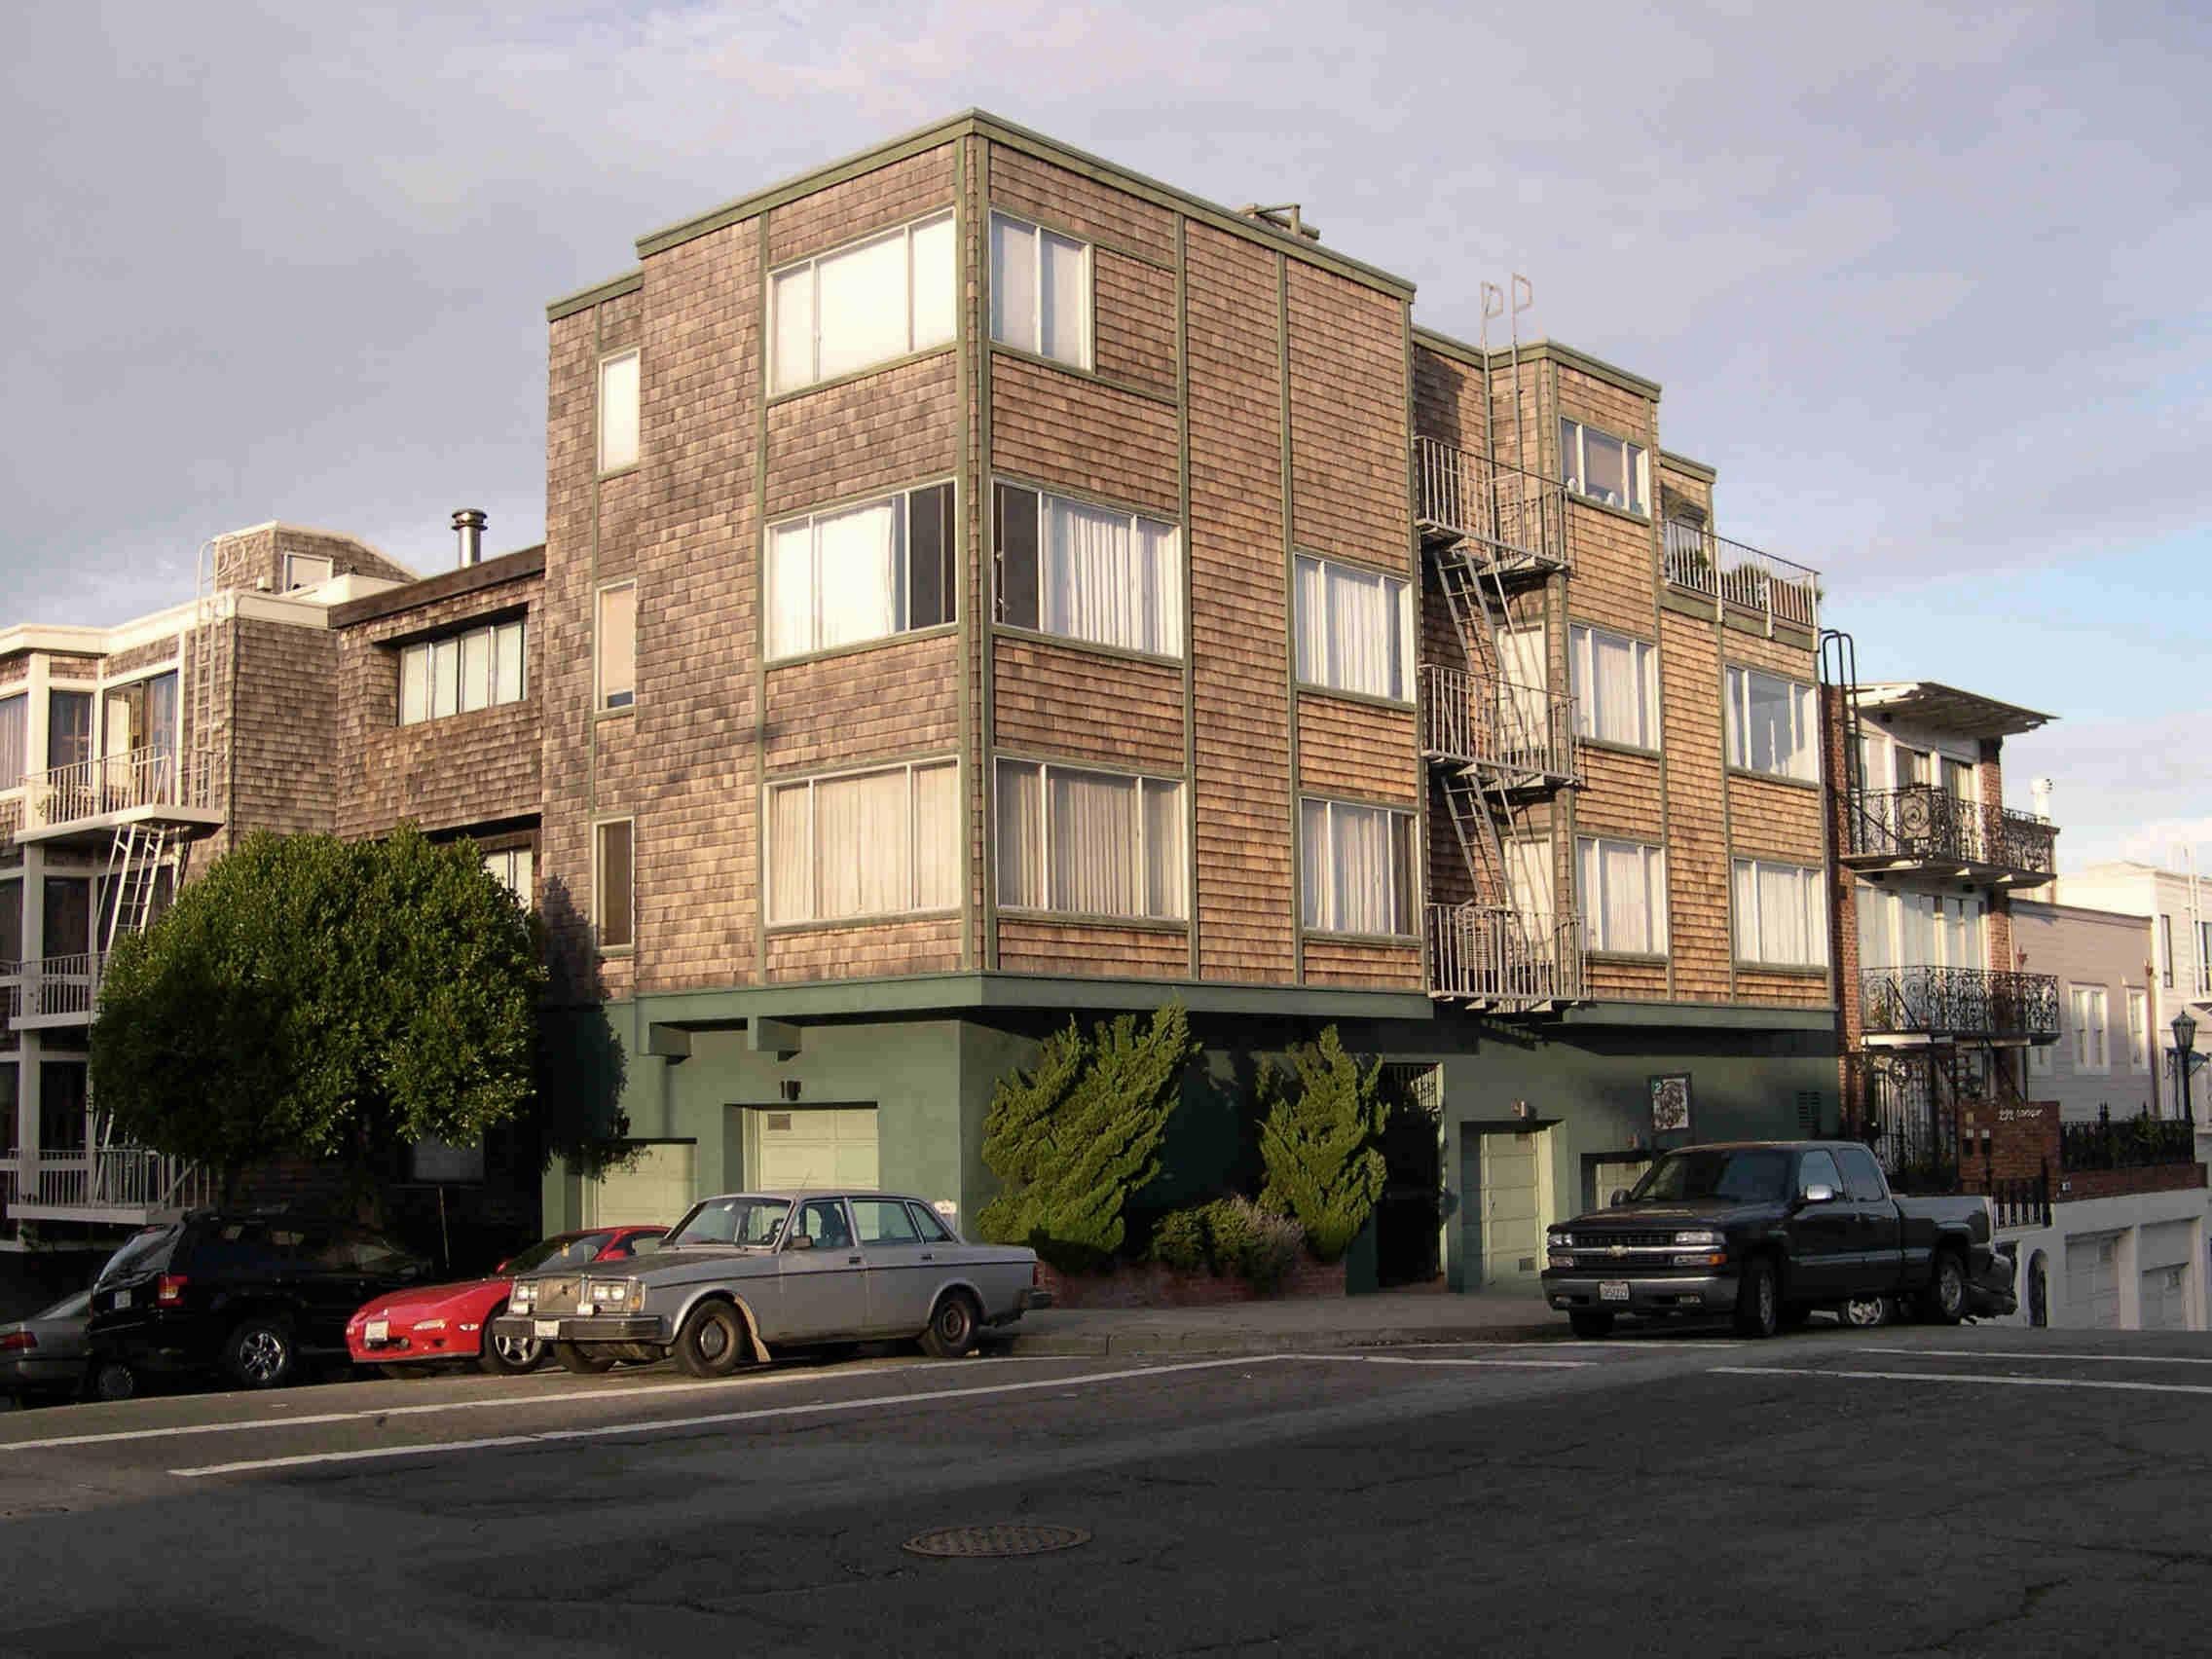 Vertigo - Midge's Apartment